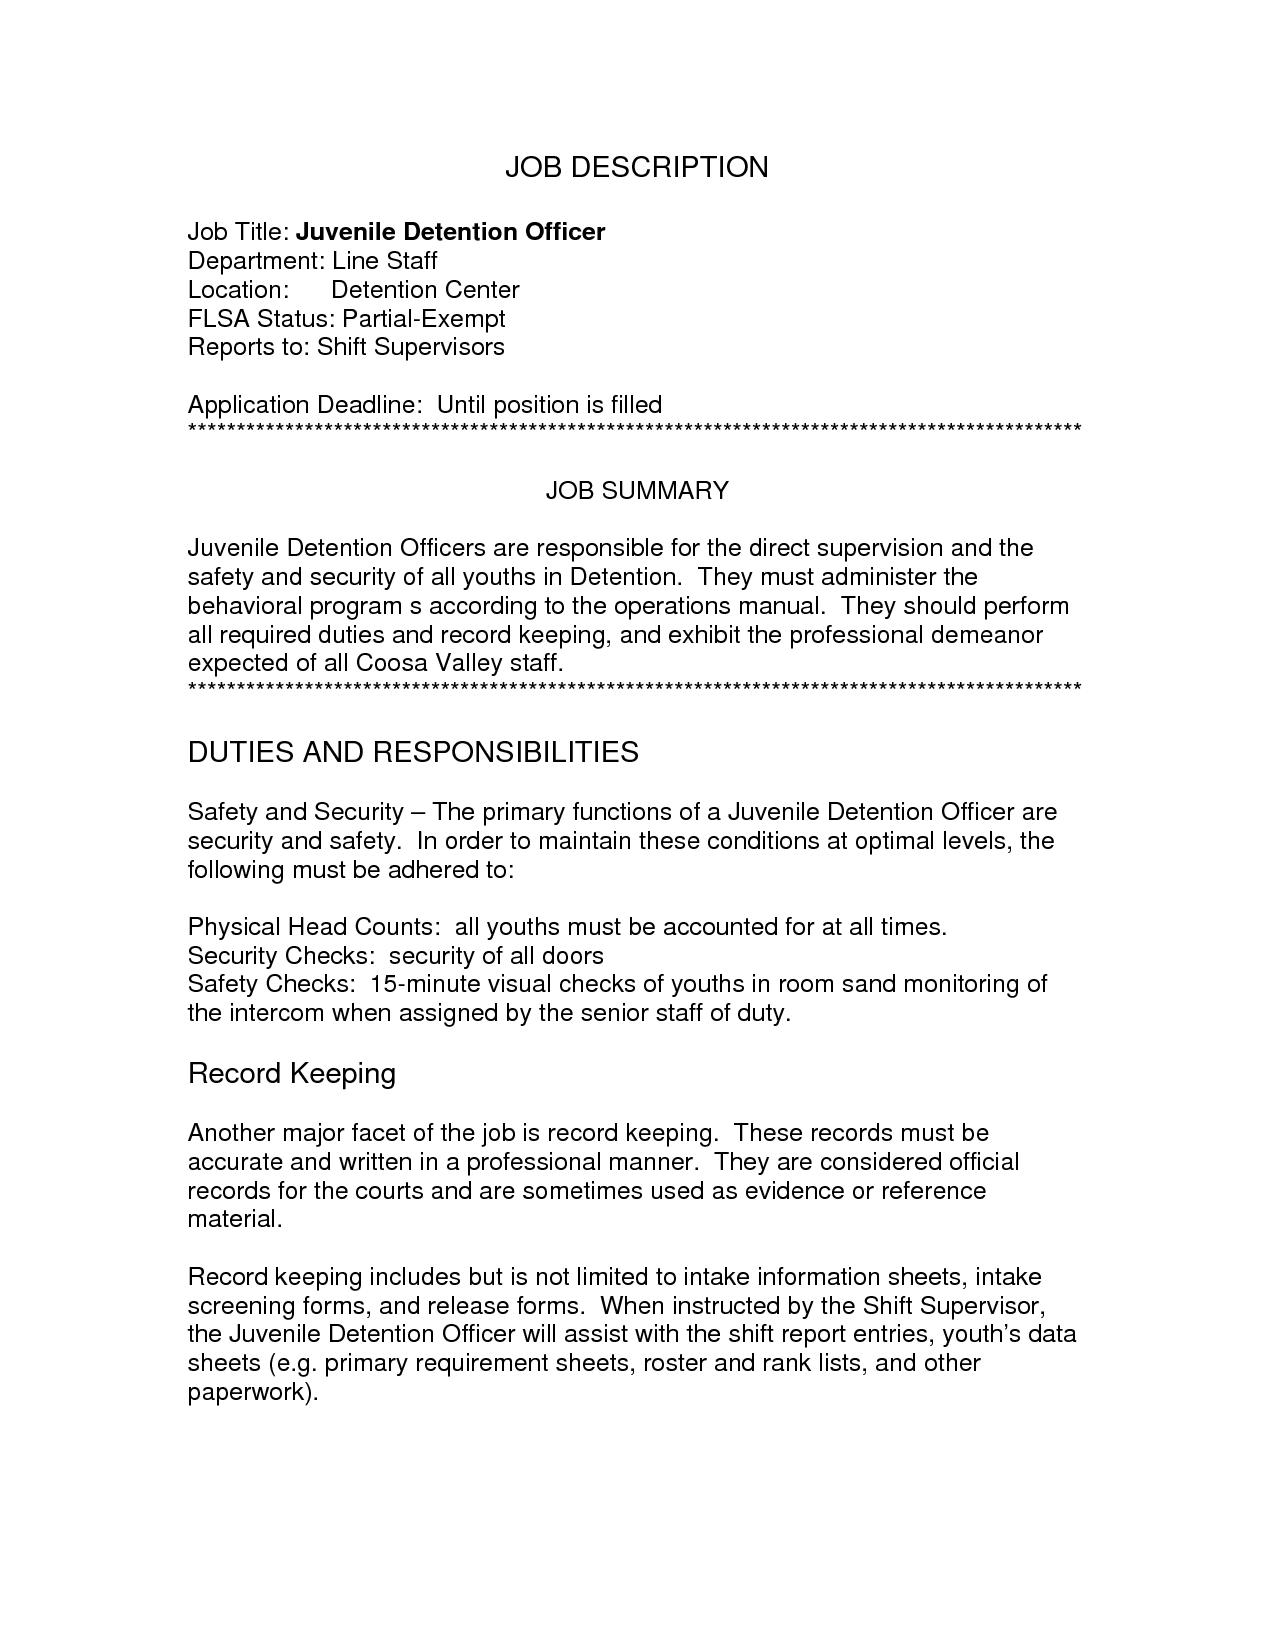 Juvenile Detention Officer Resume Objectivecareer Resume Template Career Resume Template